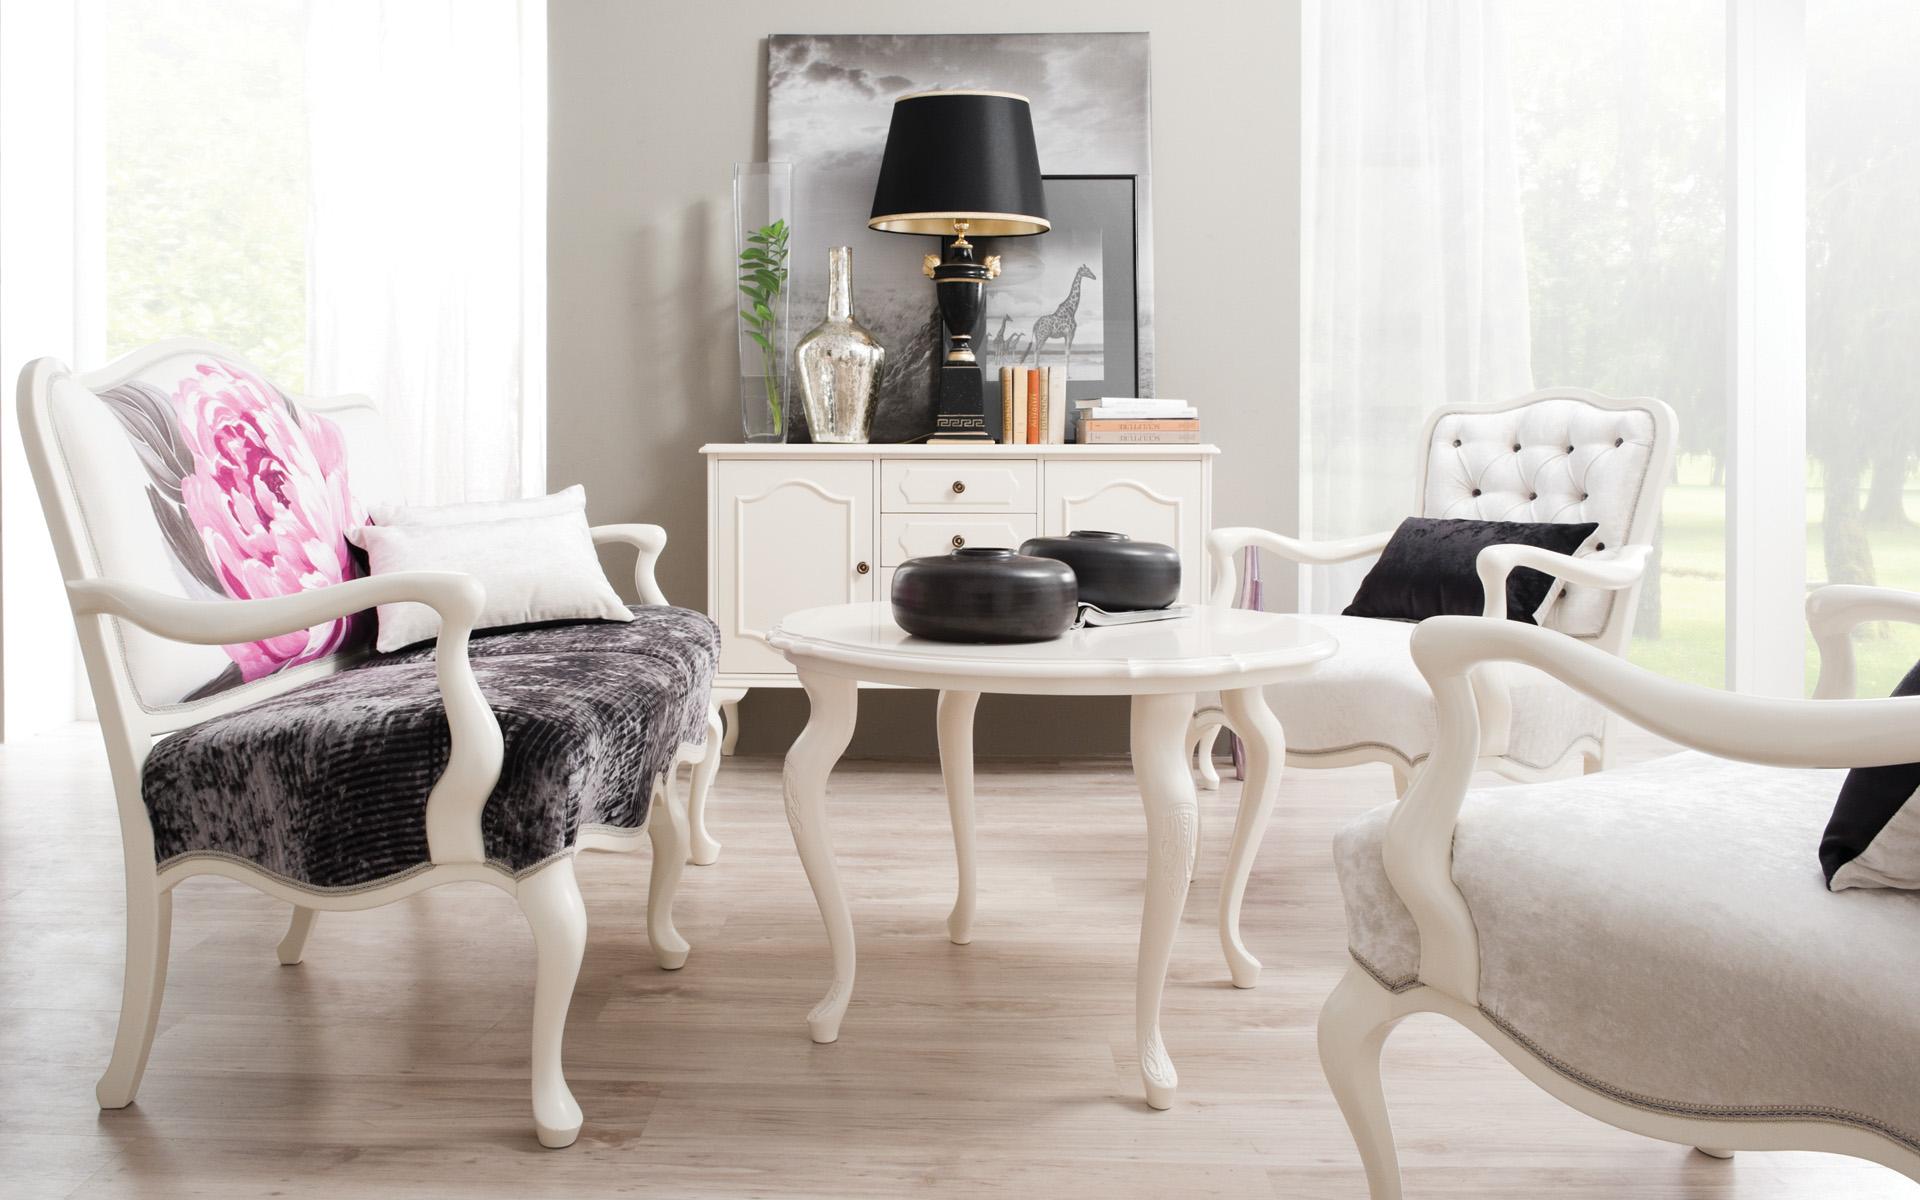 dnevna-soba_day-room_Wohnzimmer_Beli-barok_klasicno-pohistvo_classic-furniture_Klassischen-Moebel_10